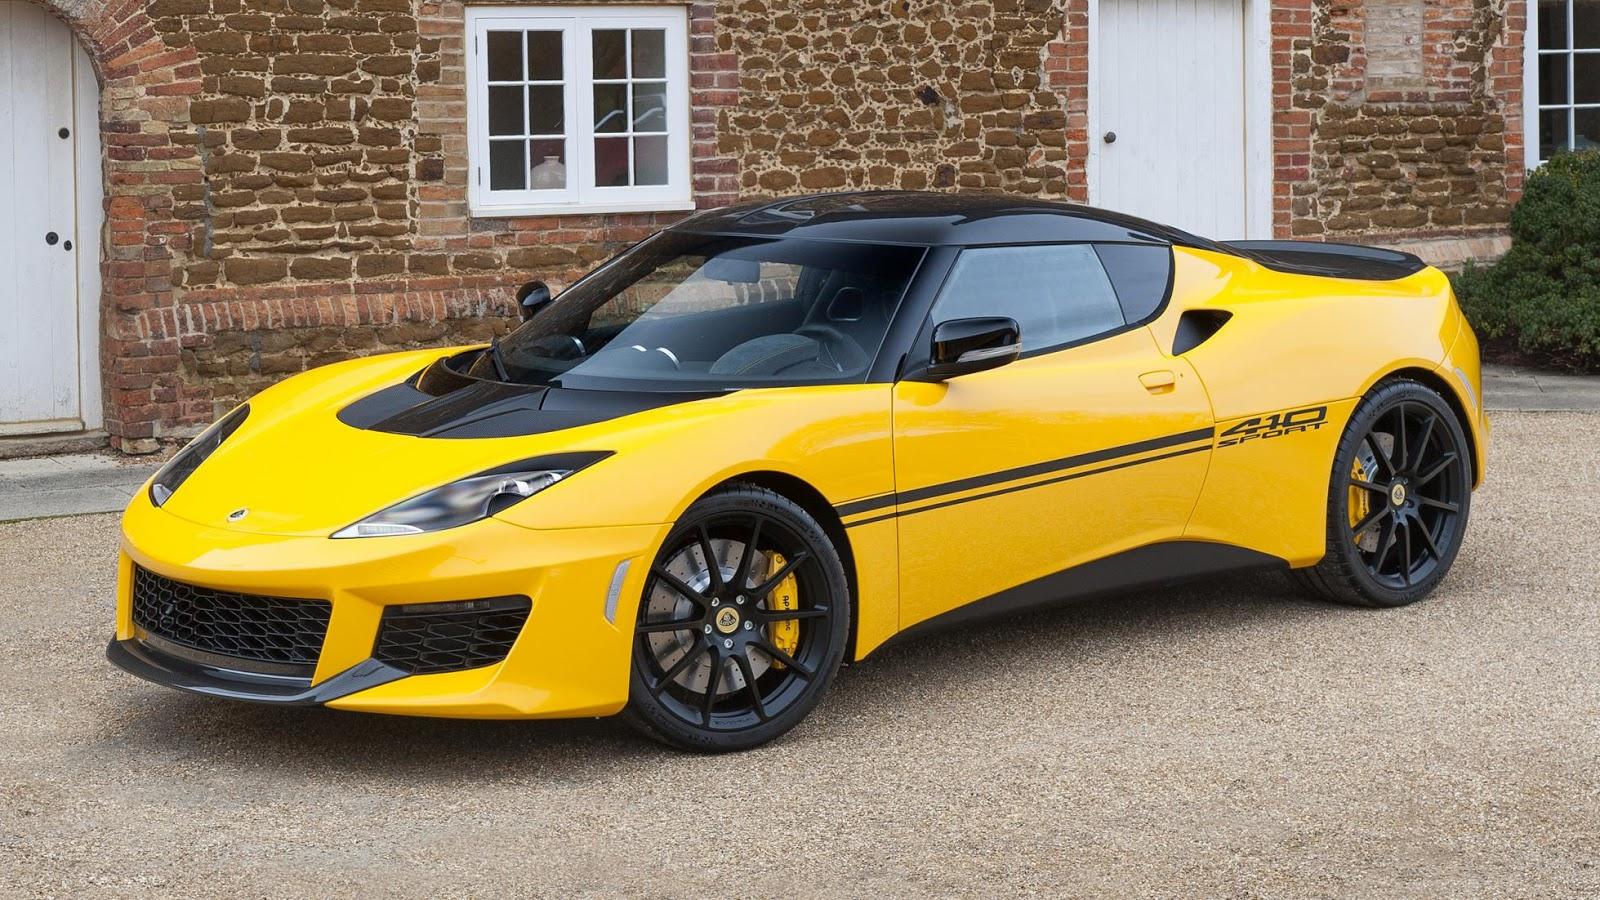 Lotus Evora Sport 410 2017 siêu xe giá bình dân